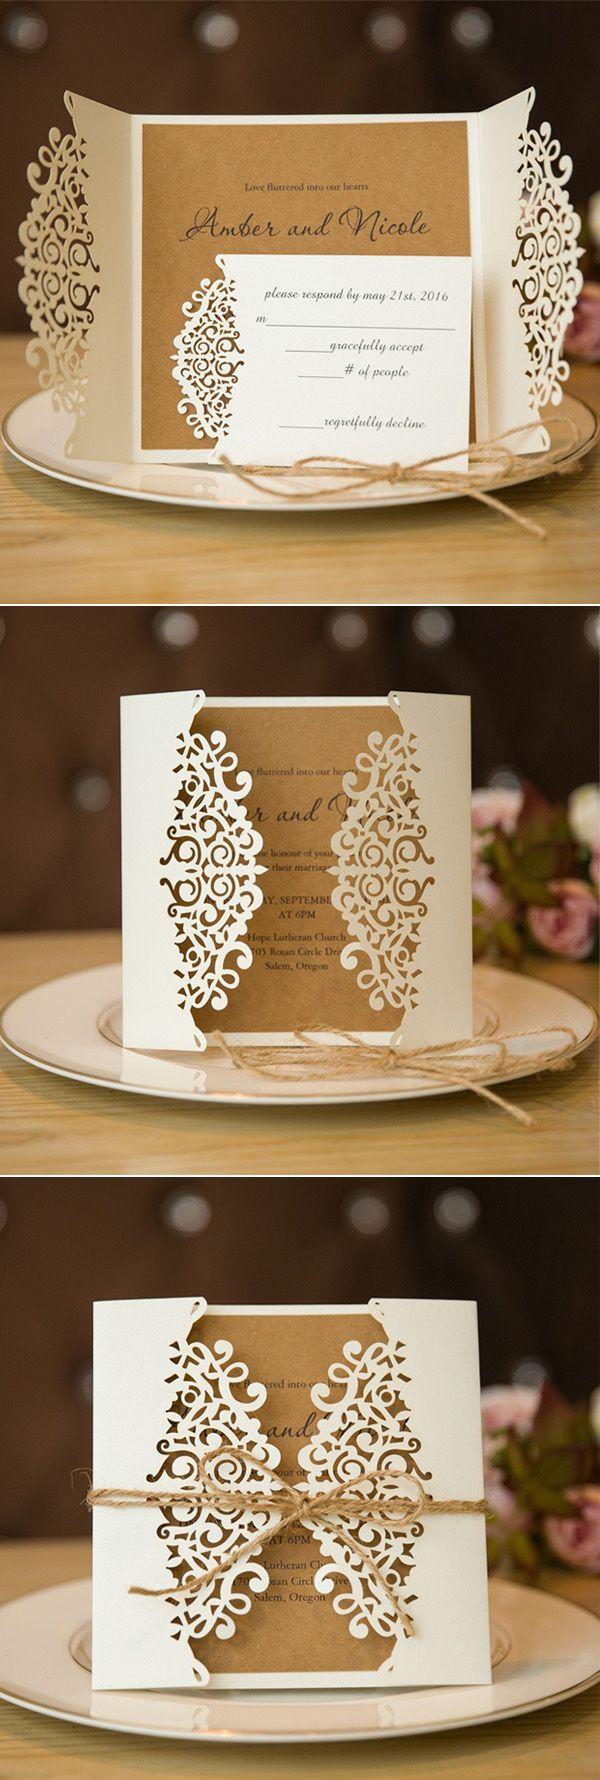 139 best Wedding Invitations images on Pinterest Laser cut